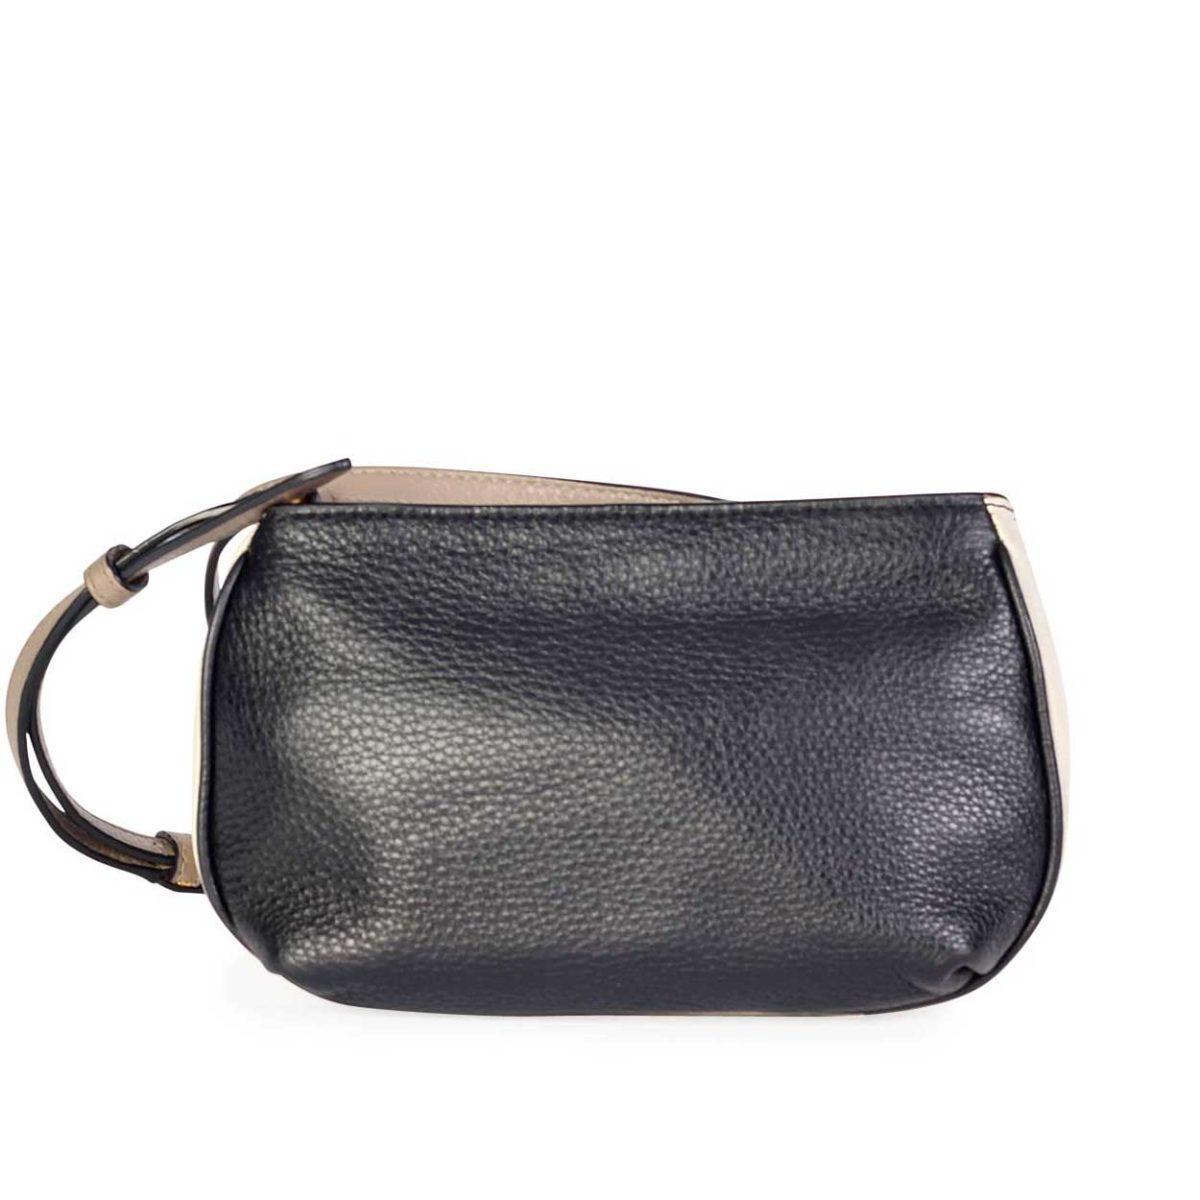 1572893db MARC BY MARC JACOBS Classic Q Percy Block Mini Crossbody Bag | Luxity